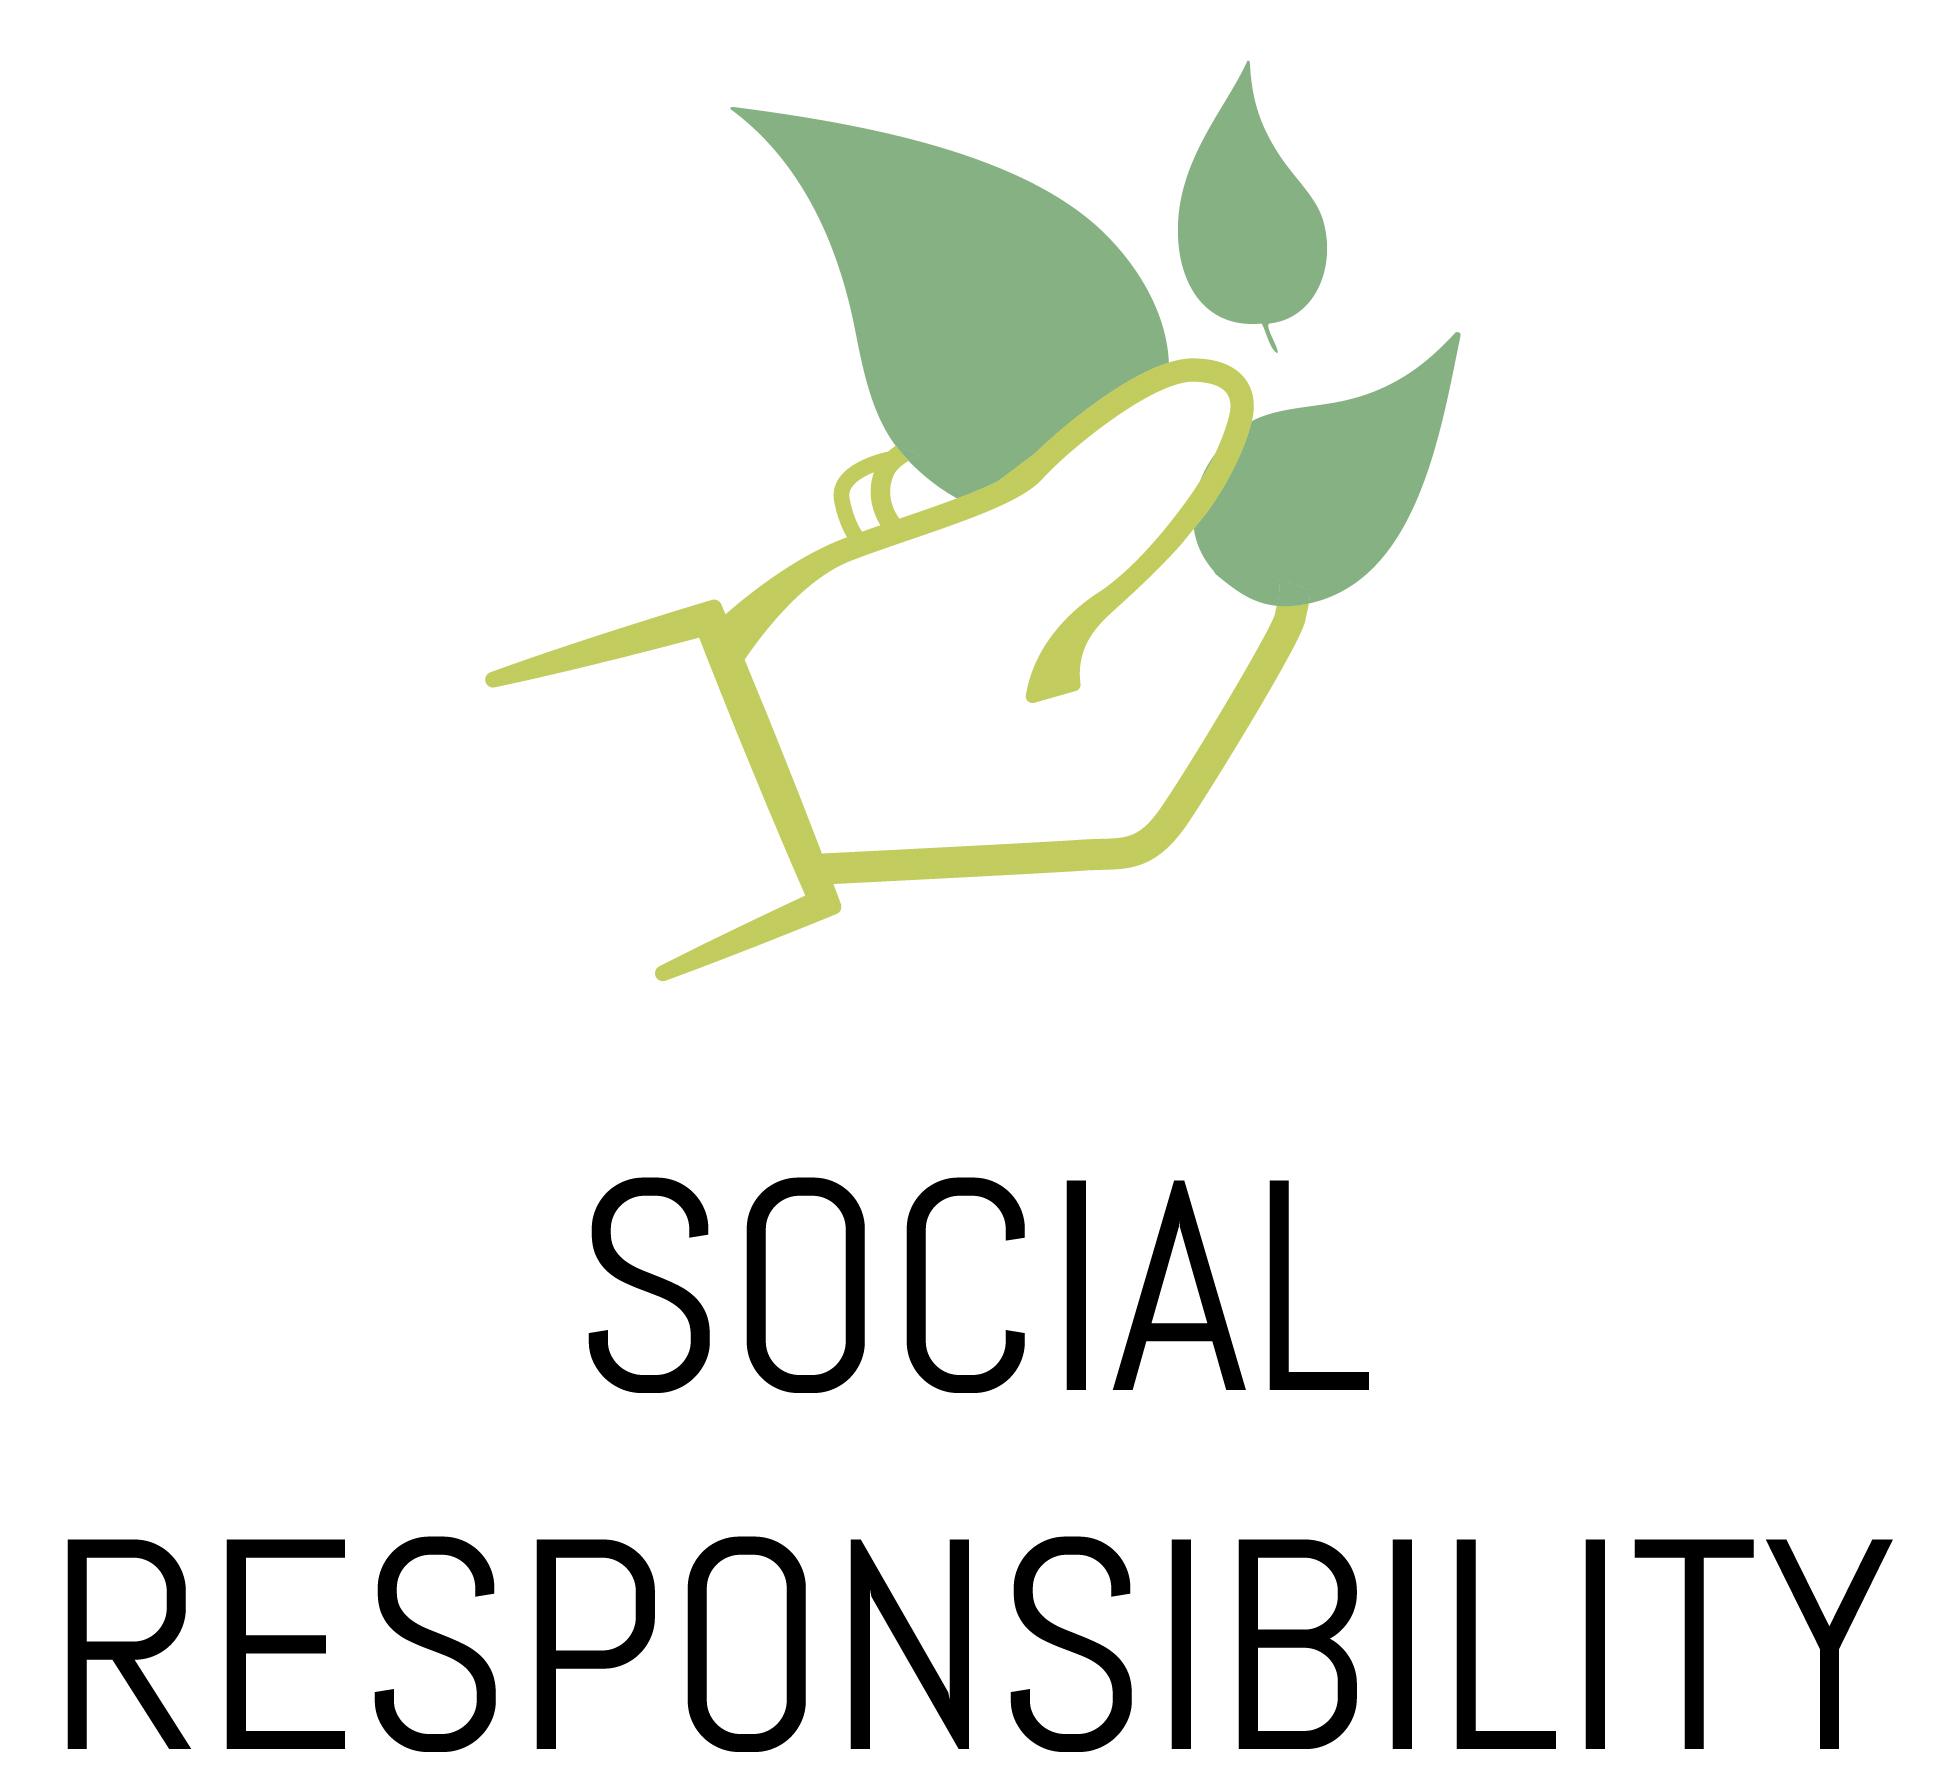 Twise social responsability